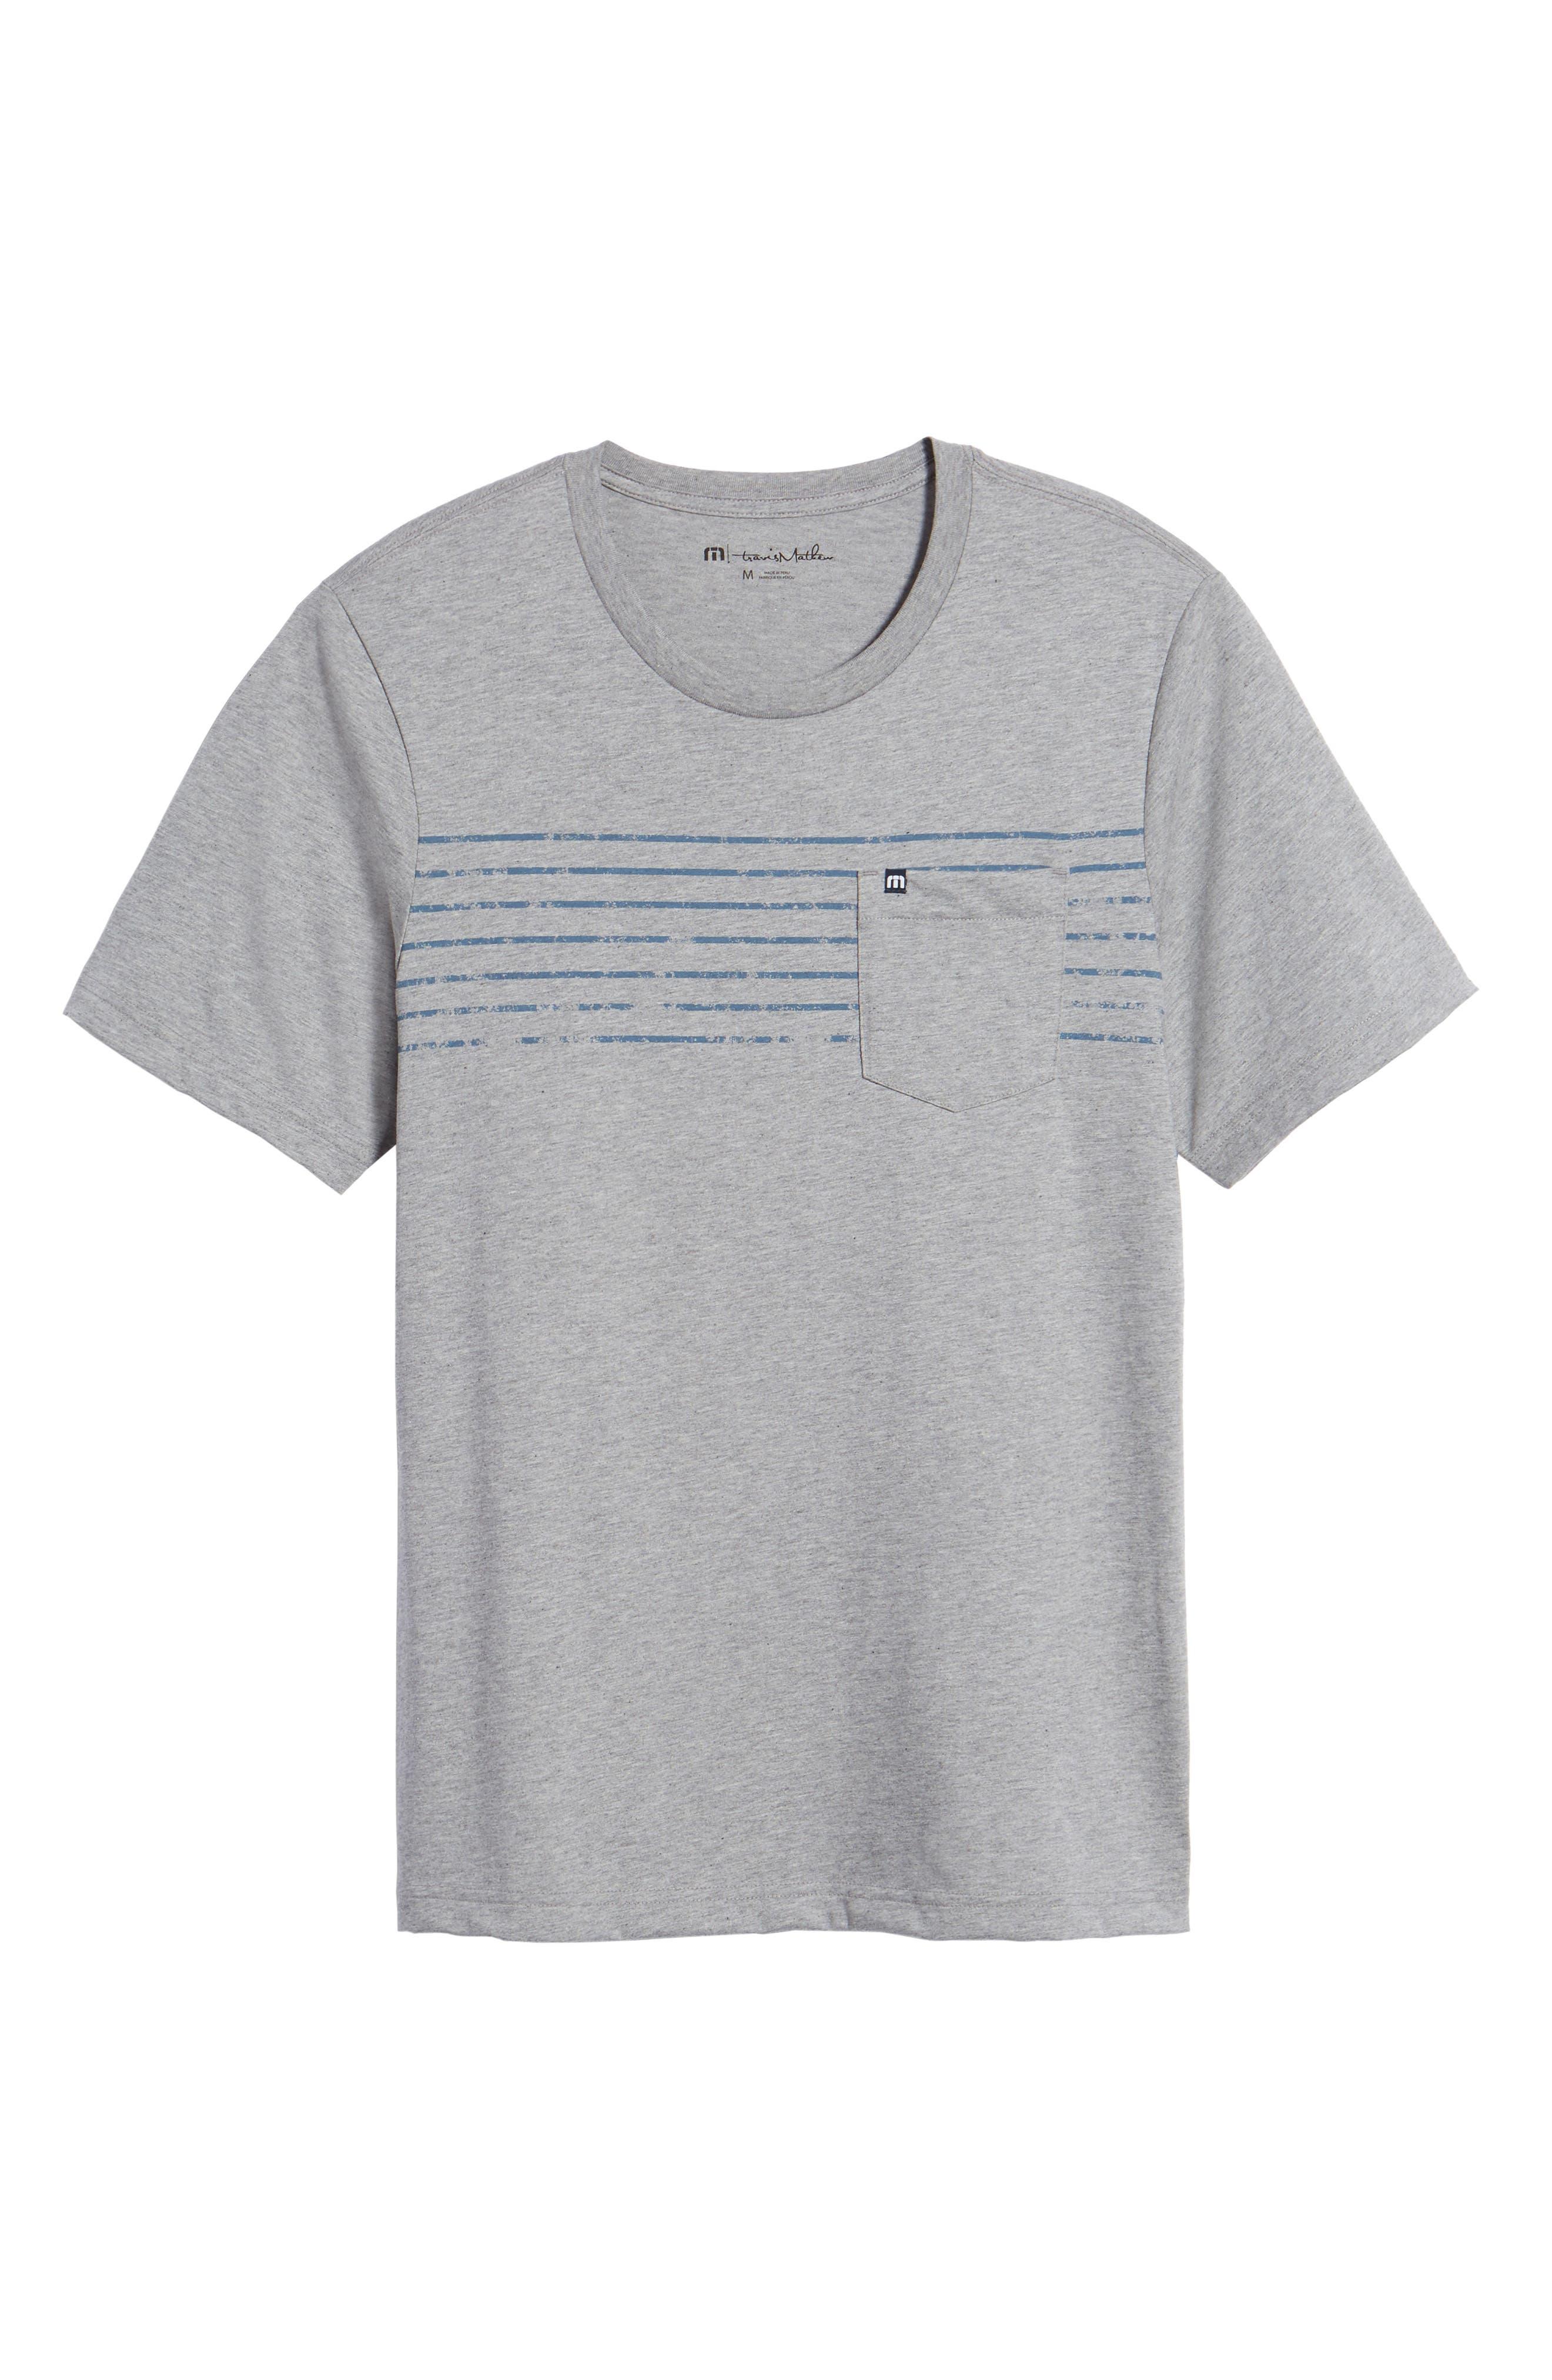 Bogue Pocket T-Shirt,                             Alternate thumbnail 6, color,                             020